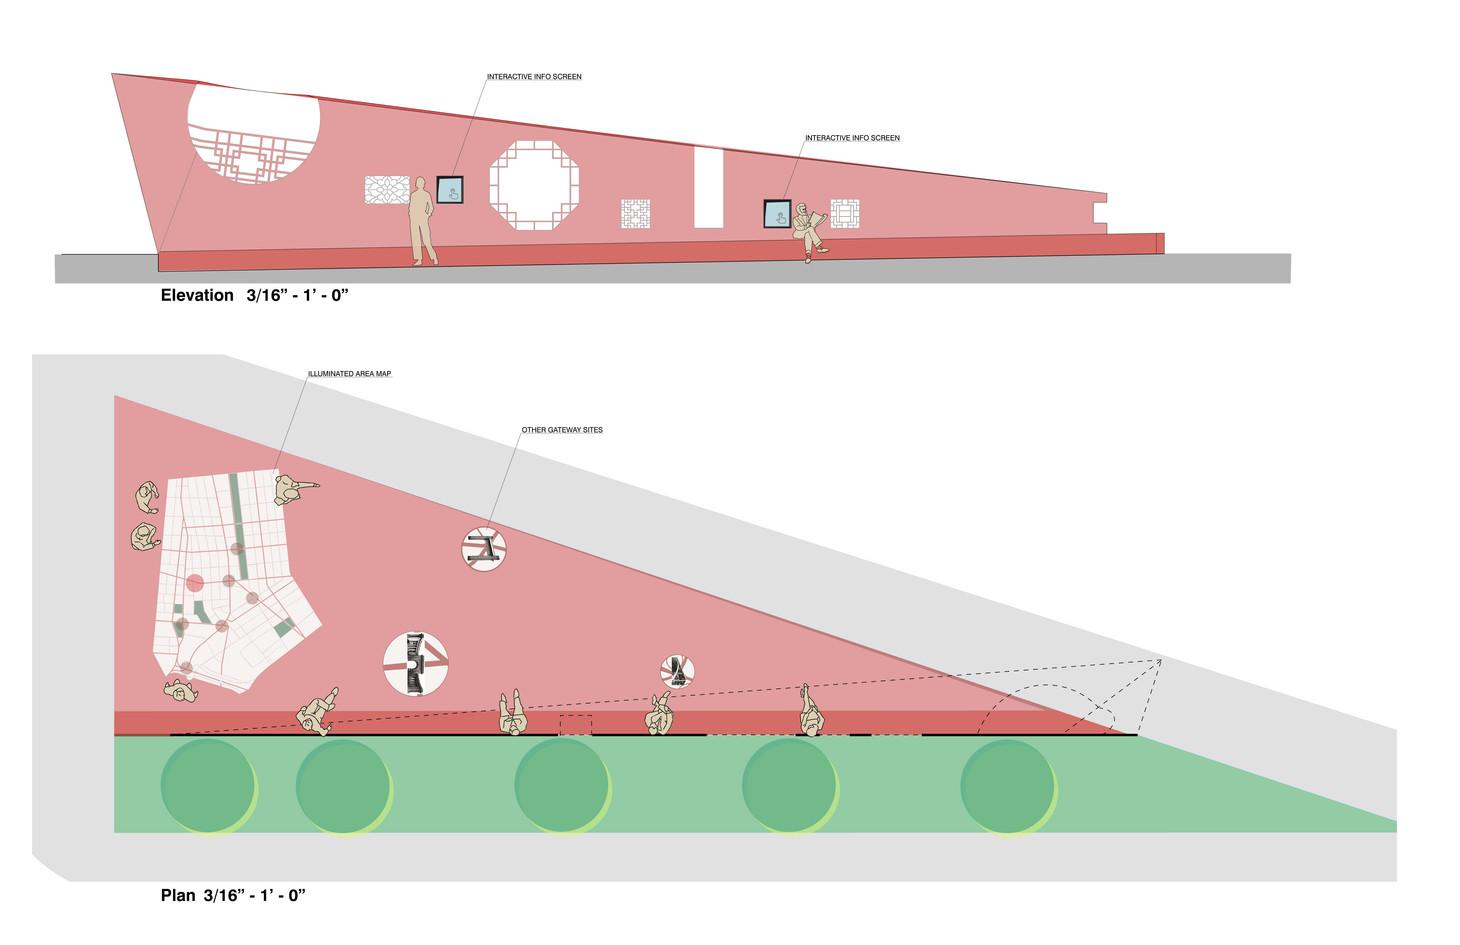 11x17-elevation plan.jpg